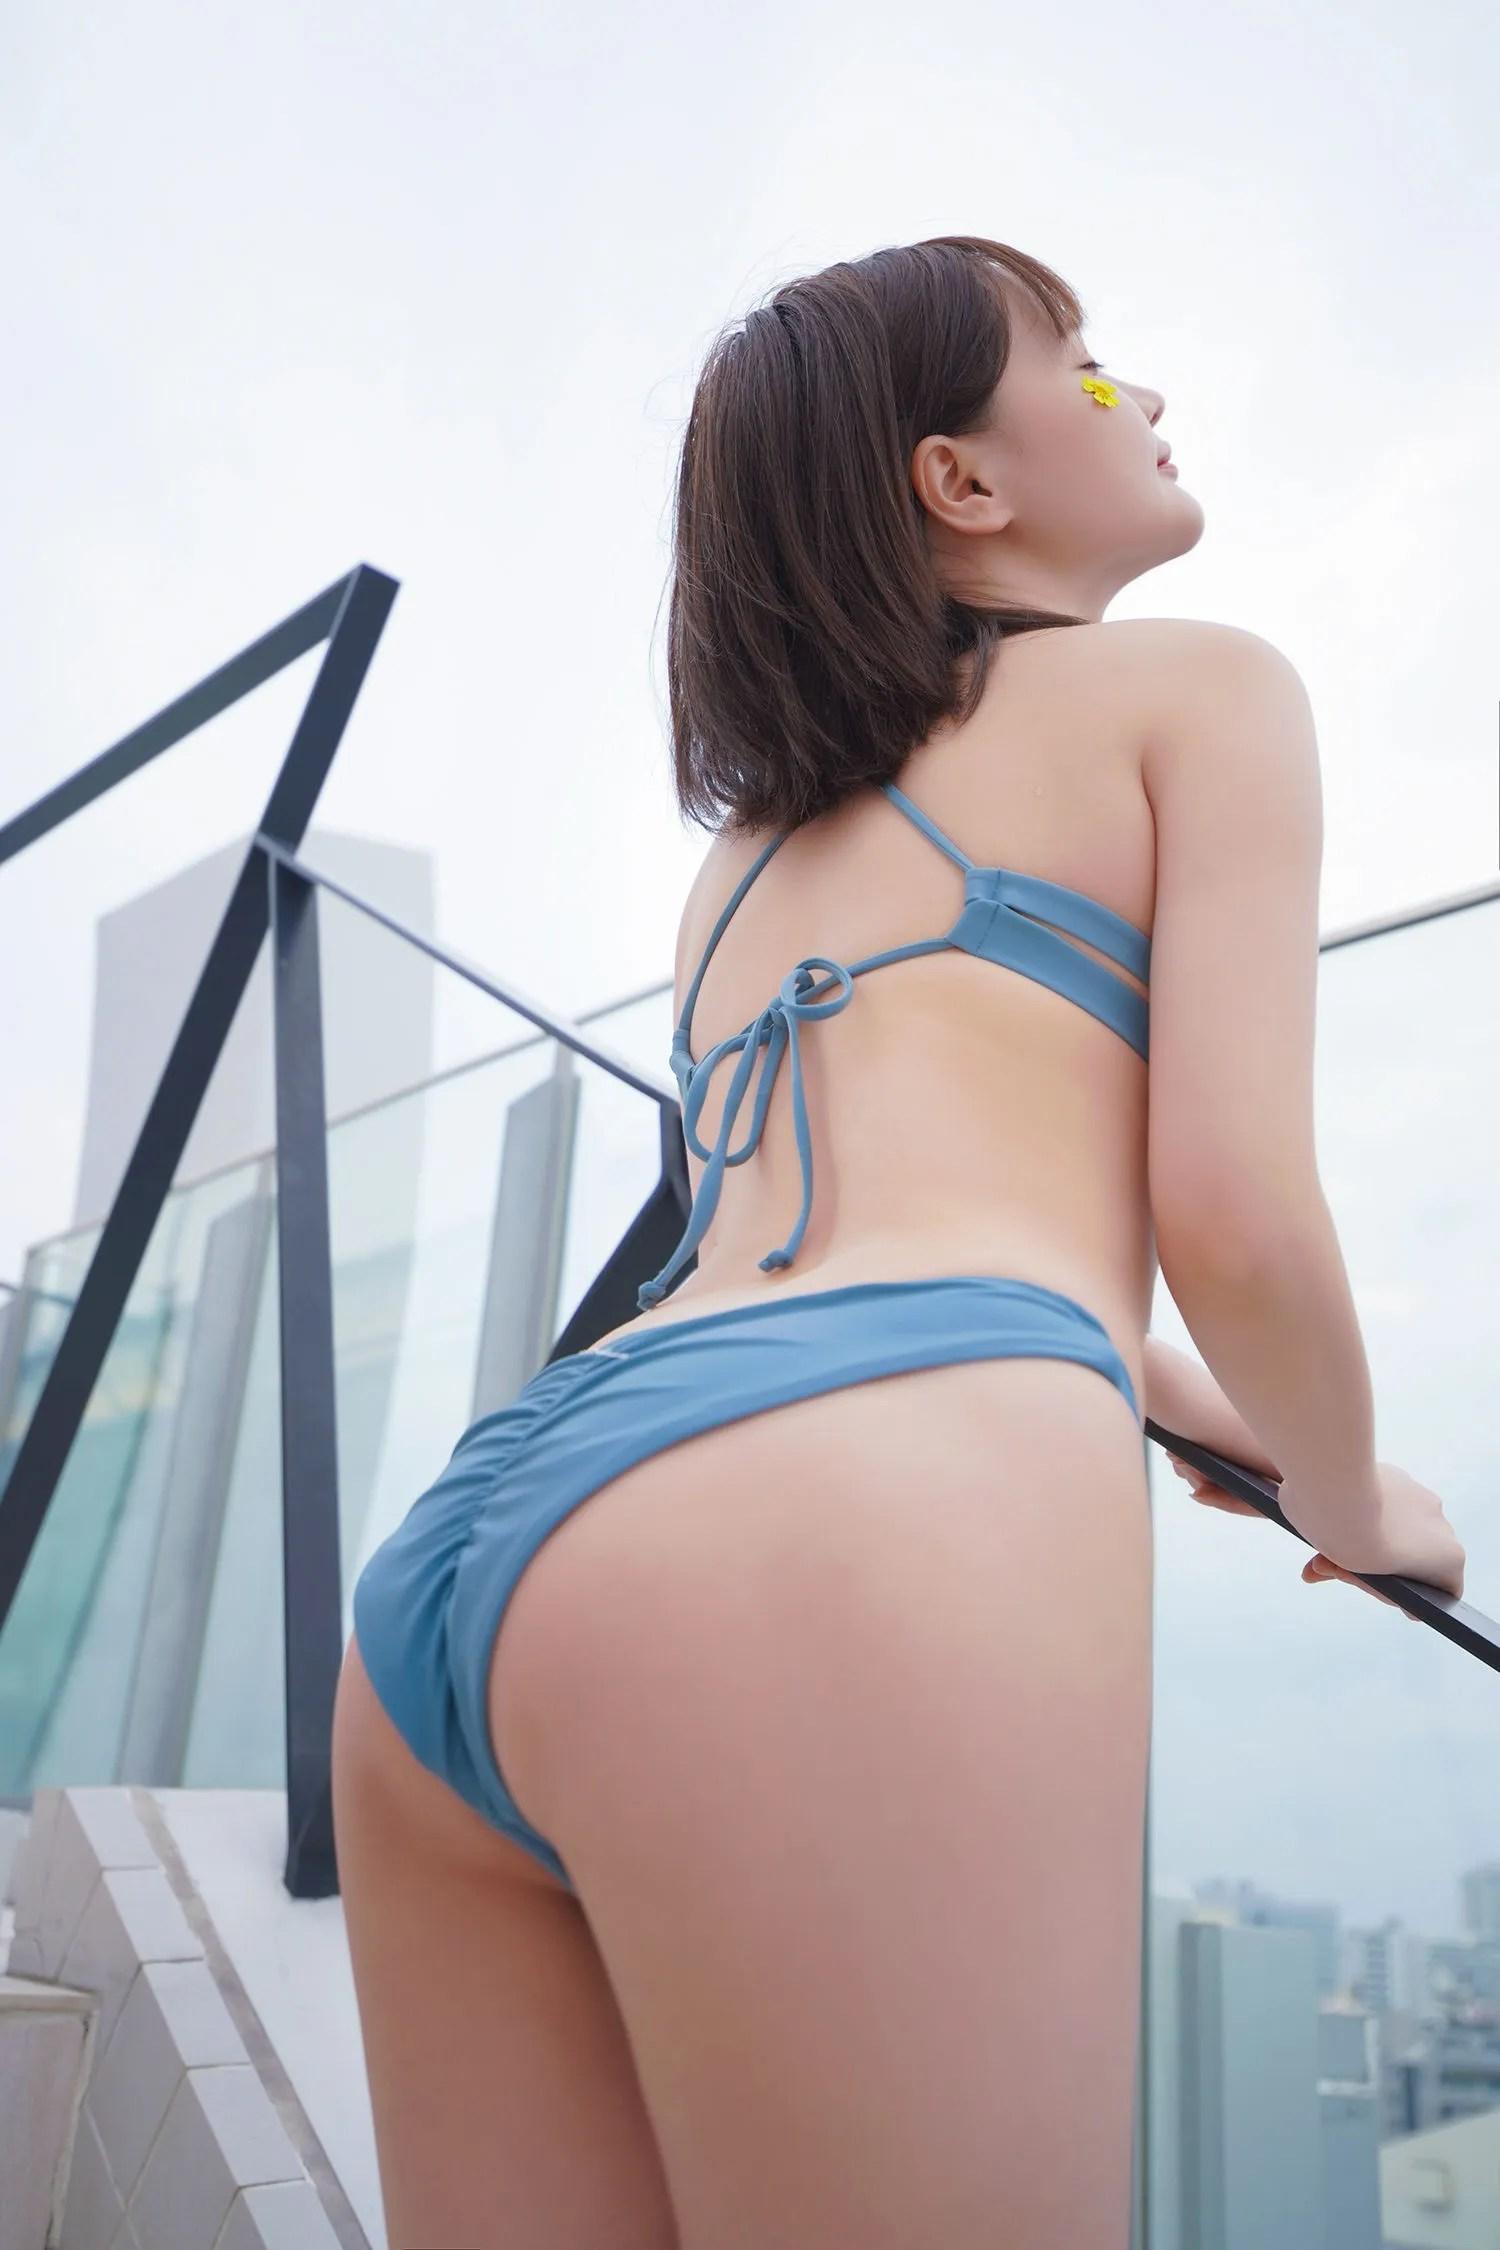 [COS福利] 千夜未来(Senya Miku)- 水着 写真套图[17P]插图(10)